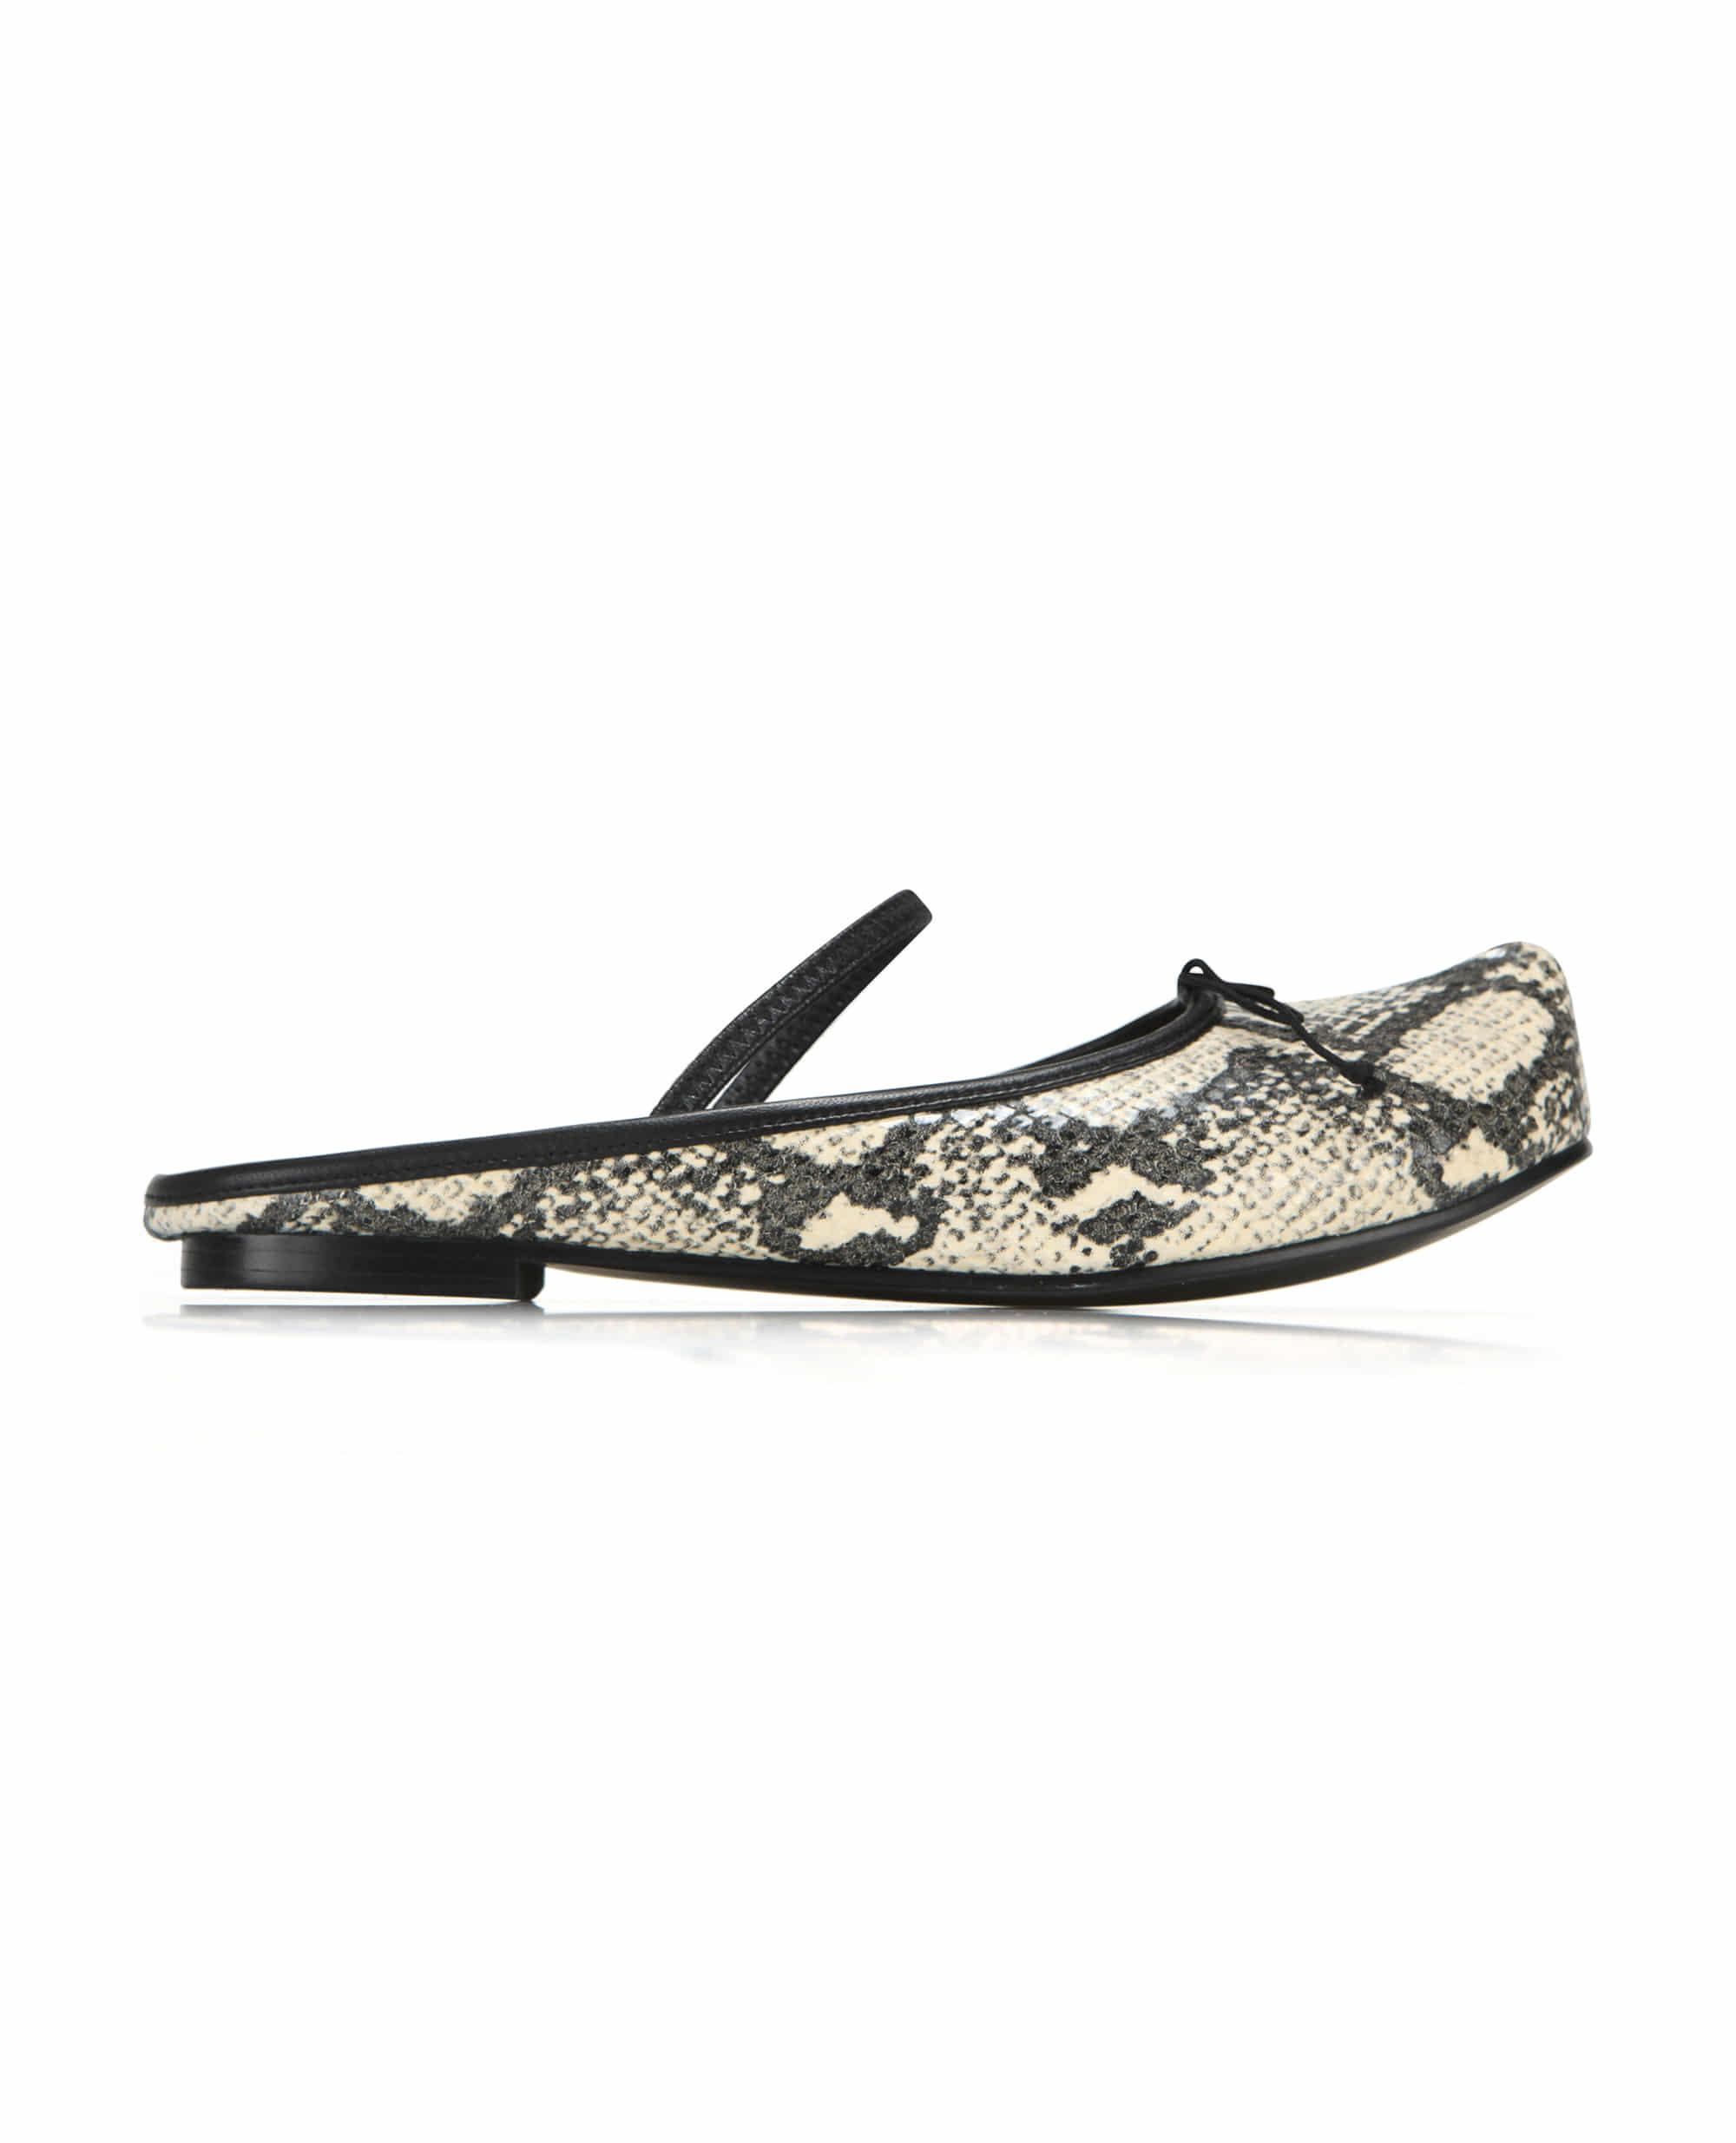 Pointed Toe Ballerina Sabot | Butter snake